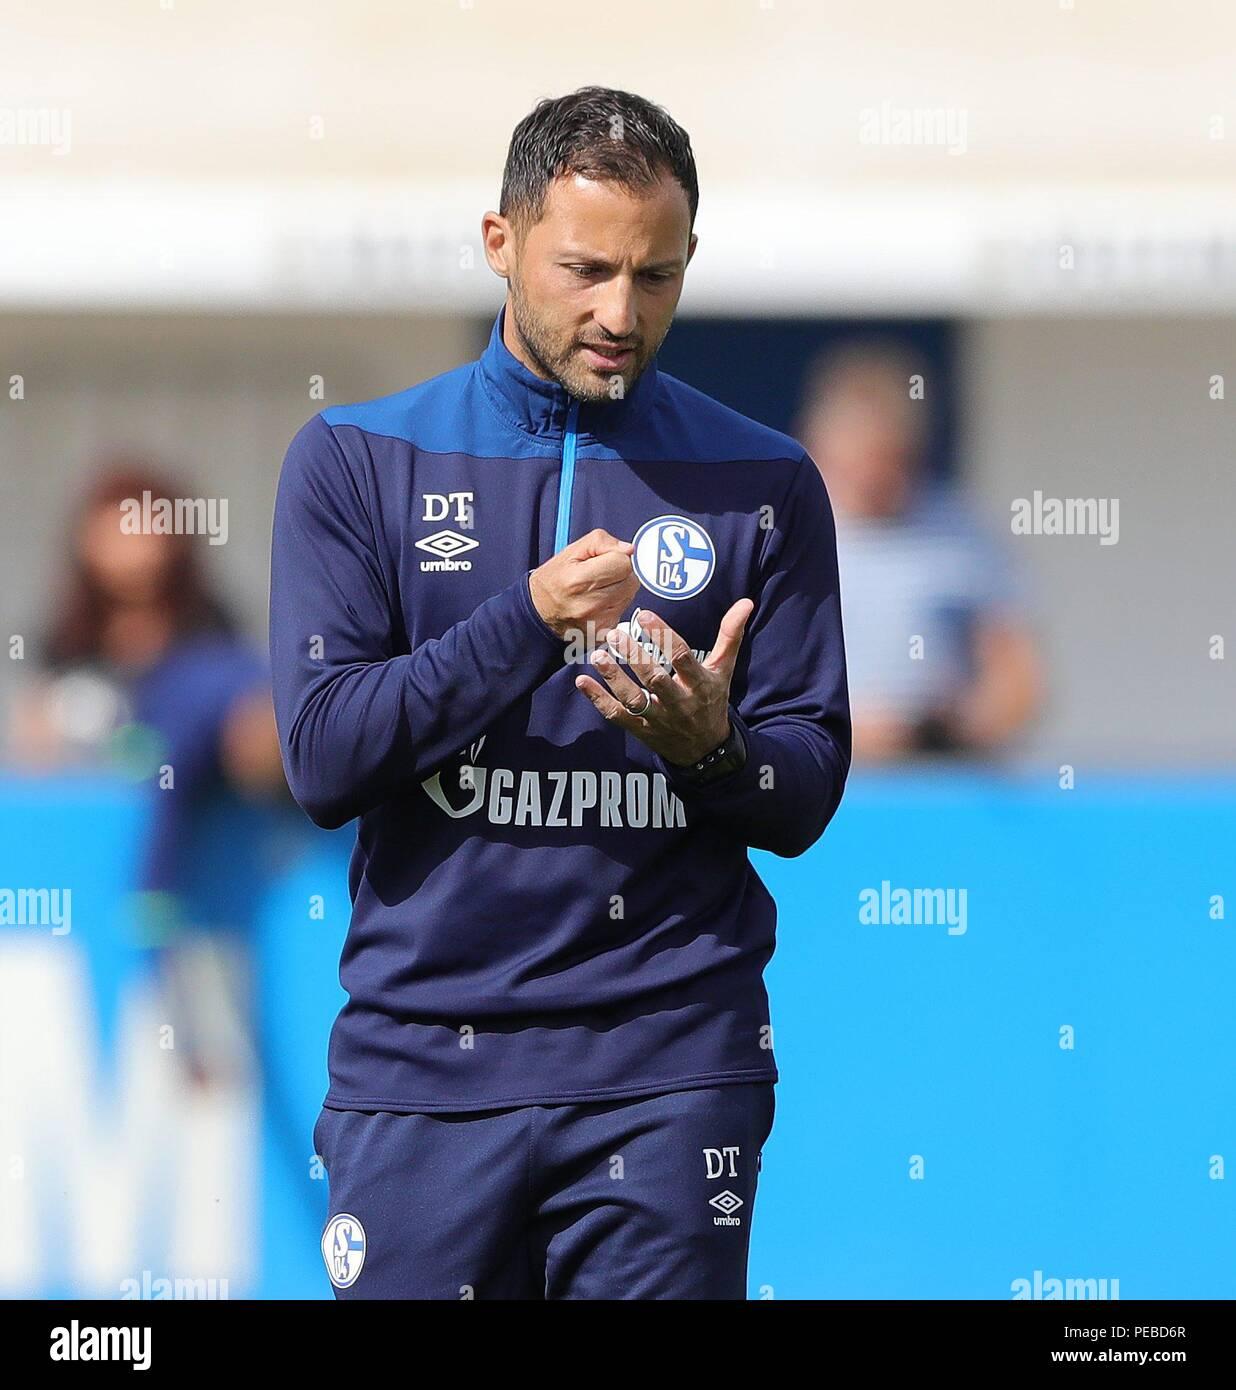 firo: 14.08.2018, football, 1.Bundesliga, season 2018/2019, FC Schalke 04, training, coach Domenico INGLES, gesture   usage worldwide - Stock Image